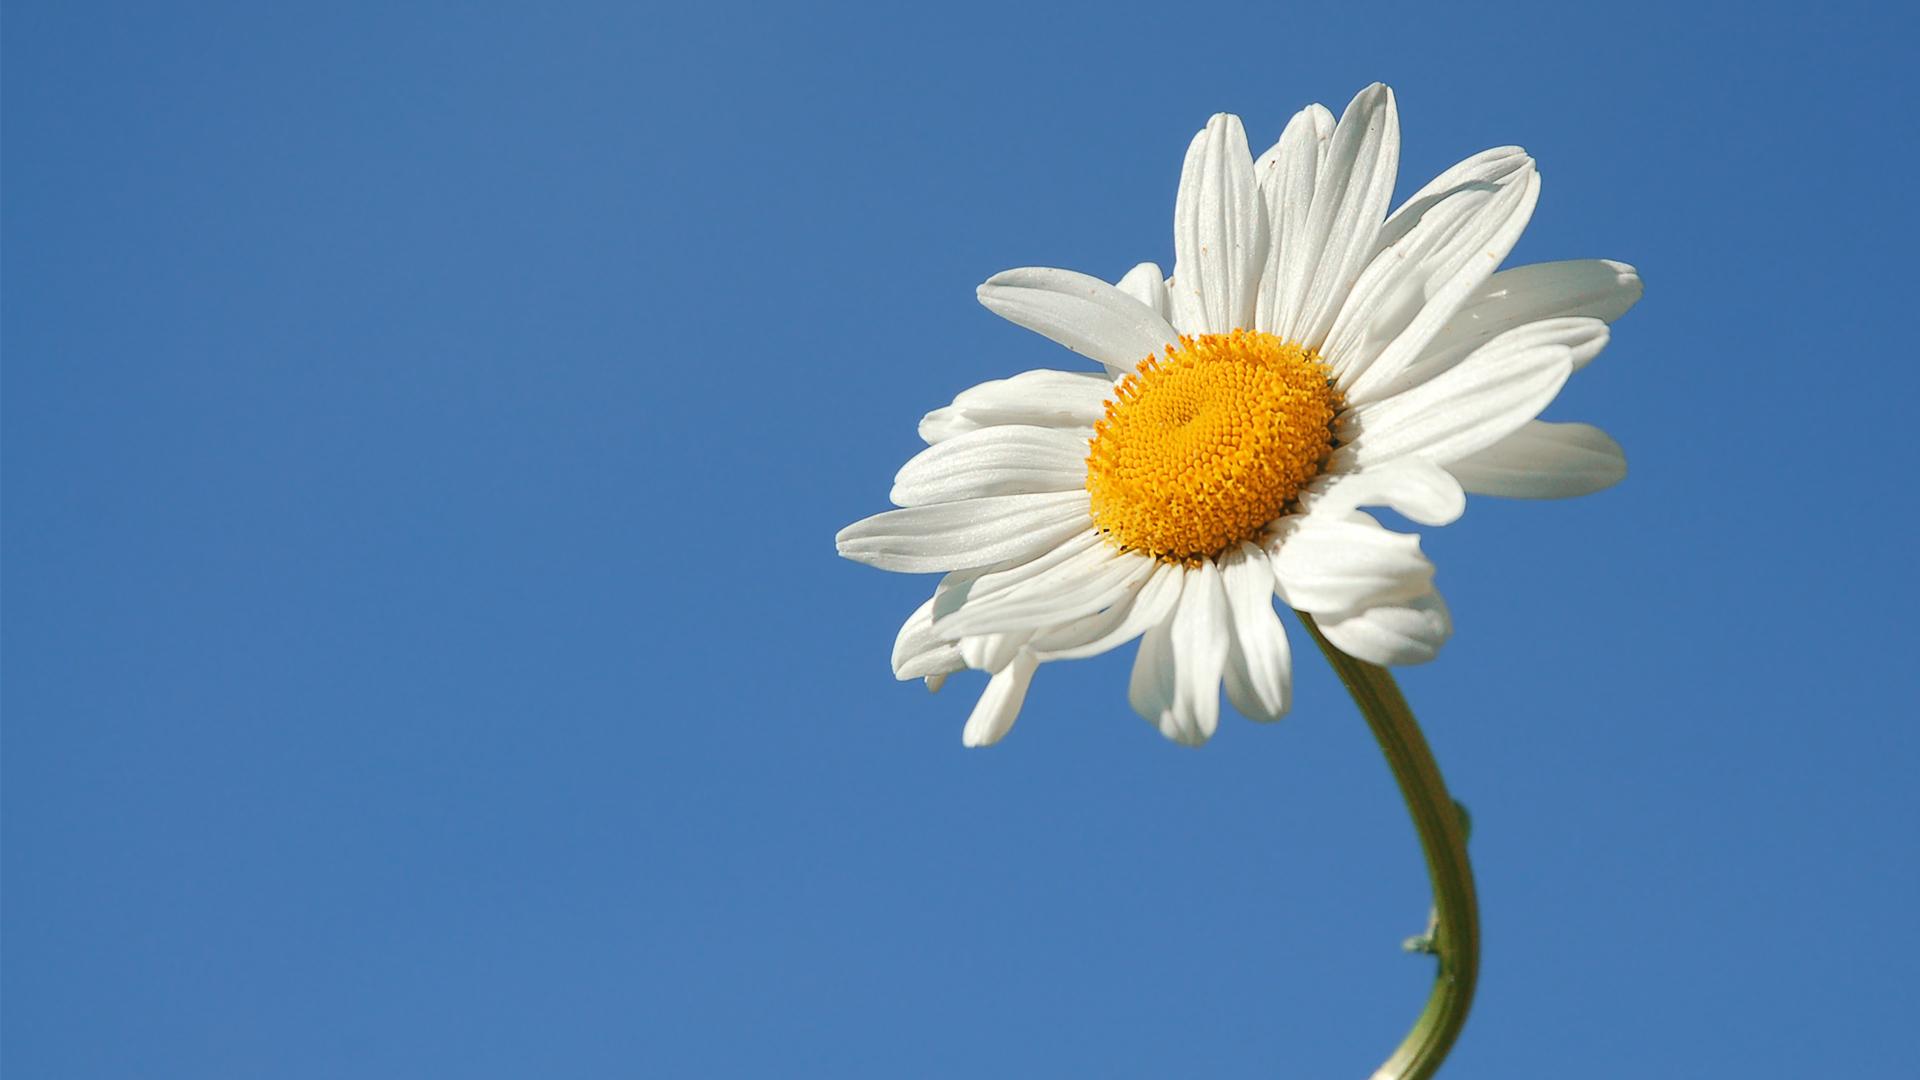 Wallpaper daisy flower sky summer wallpapers flowers   download 1920x1080